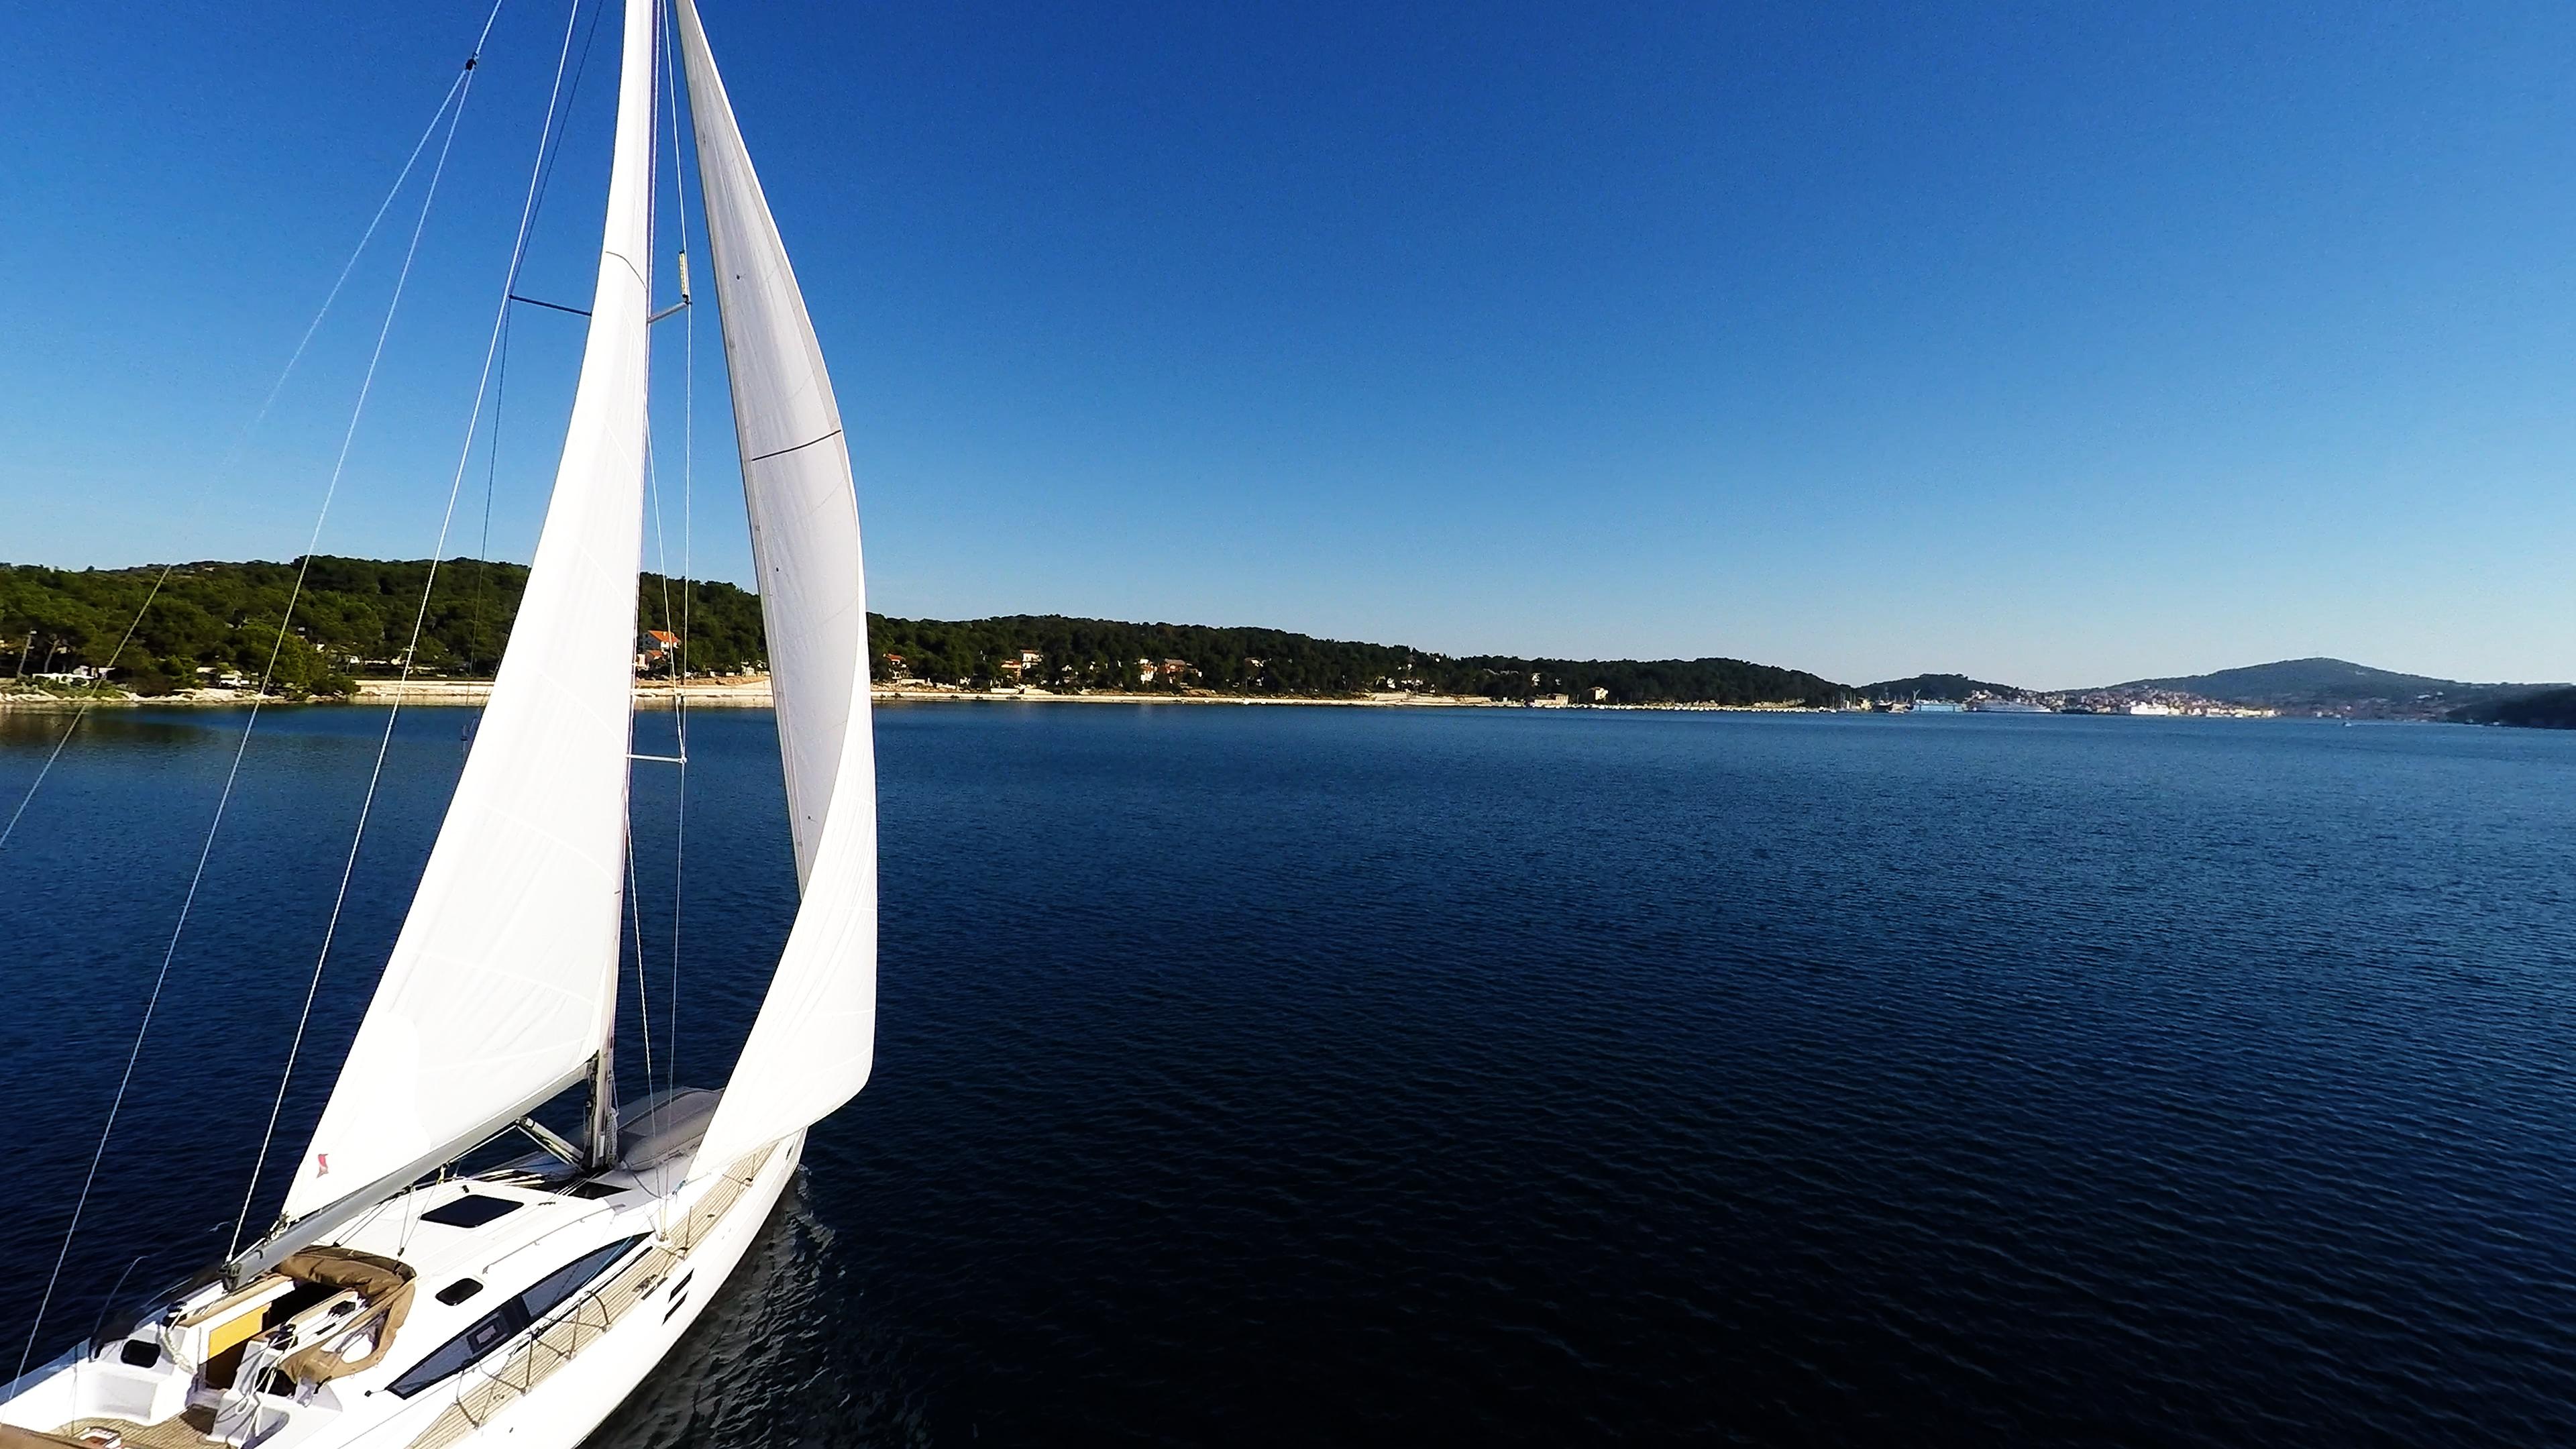 barcha a vela yacht a vela Croazia cielo blu baia del mare vele